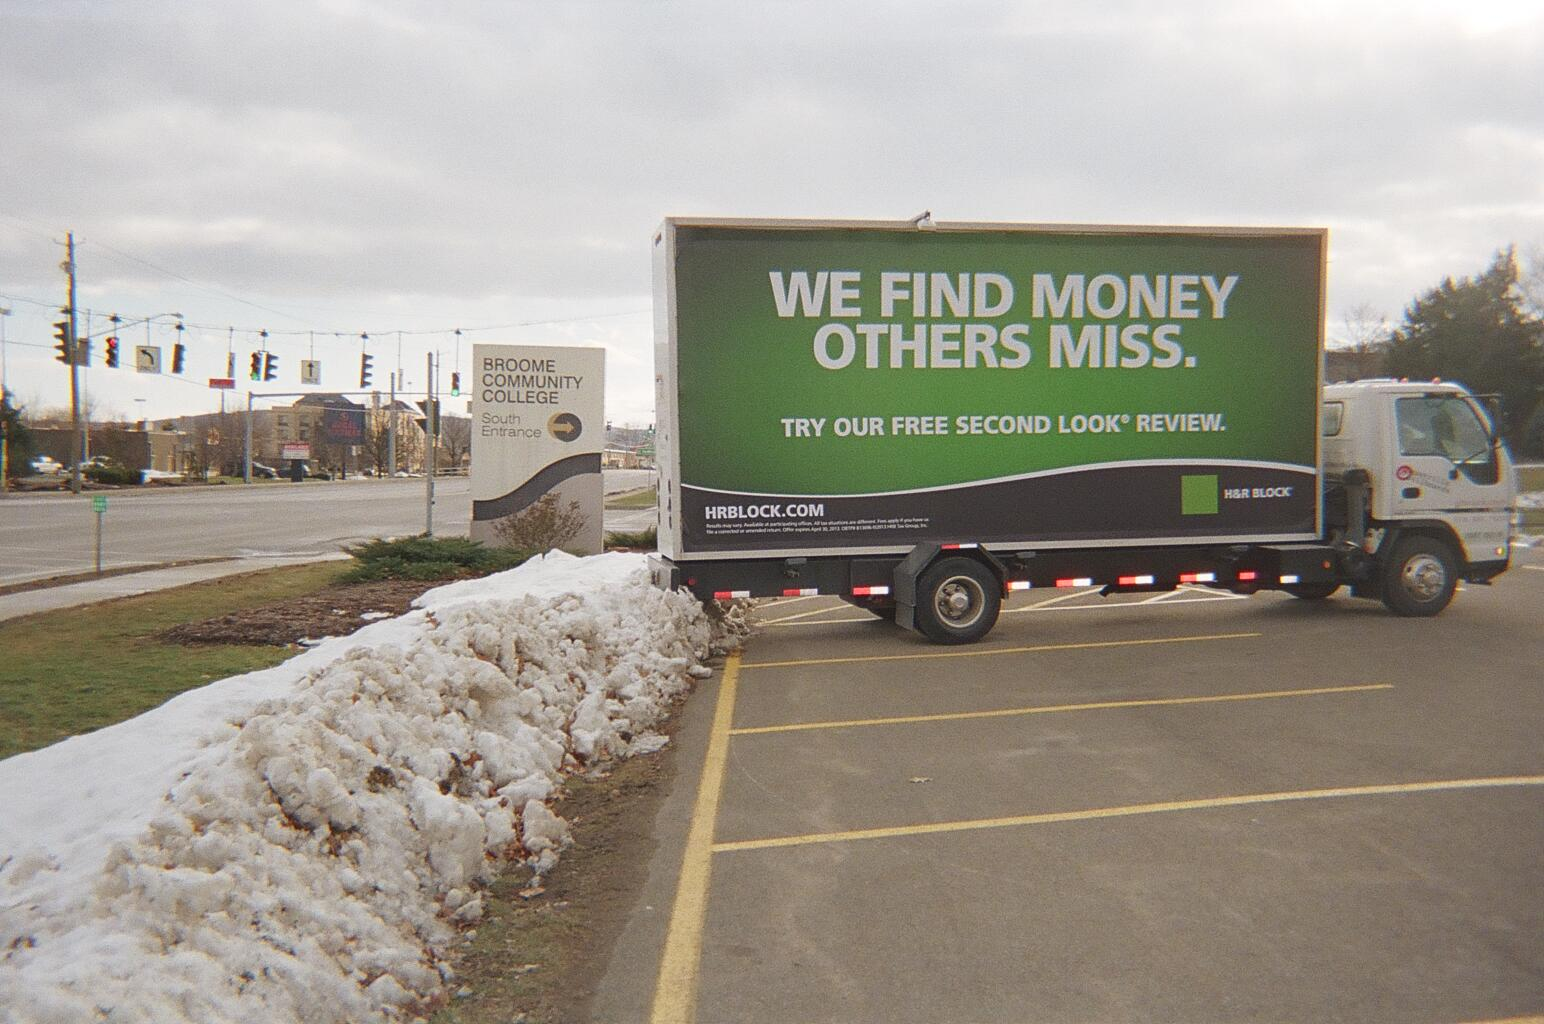 H&R Block billboard truck in Binghamton NY